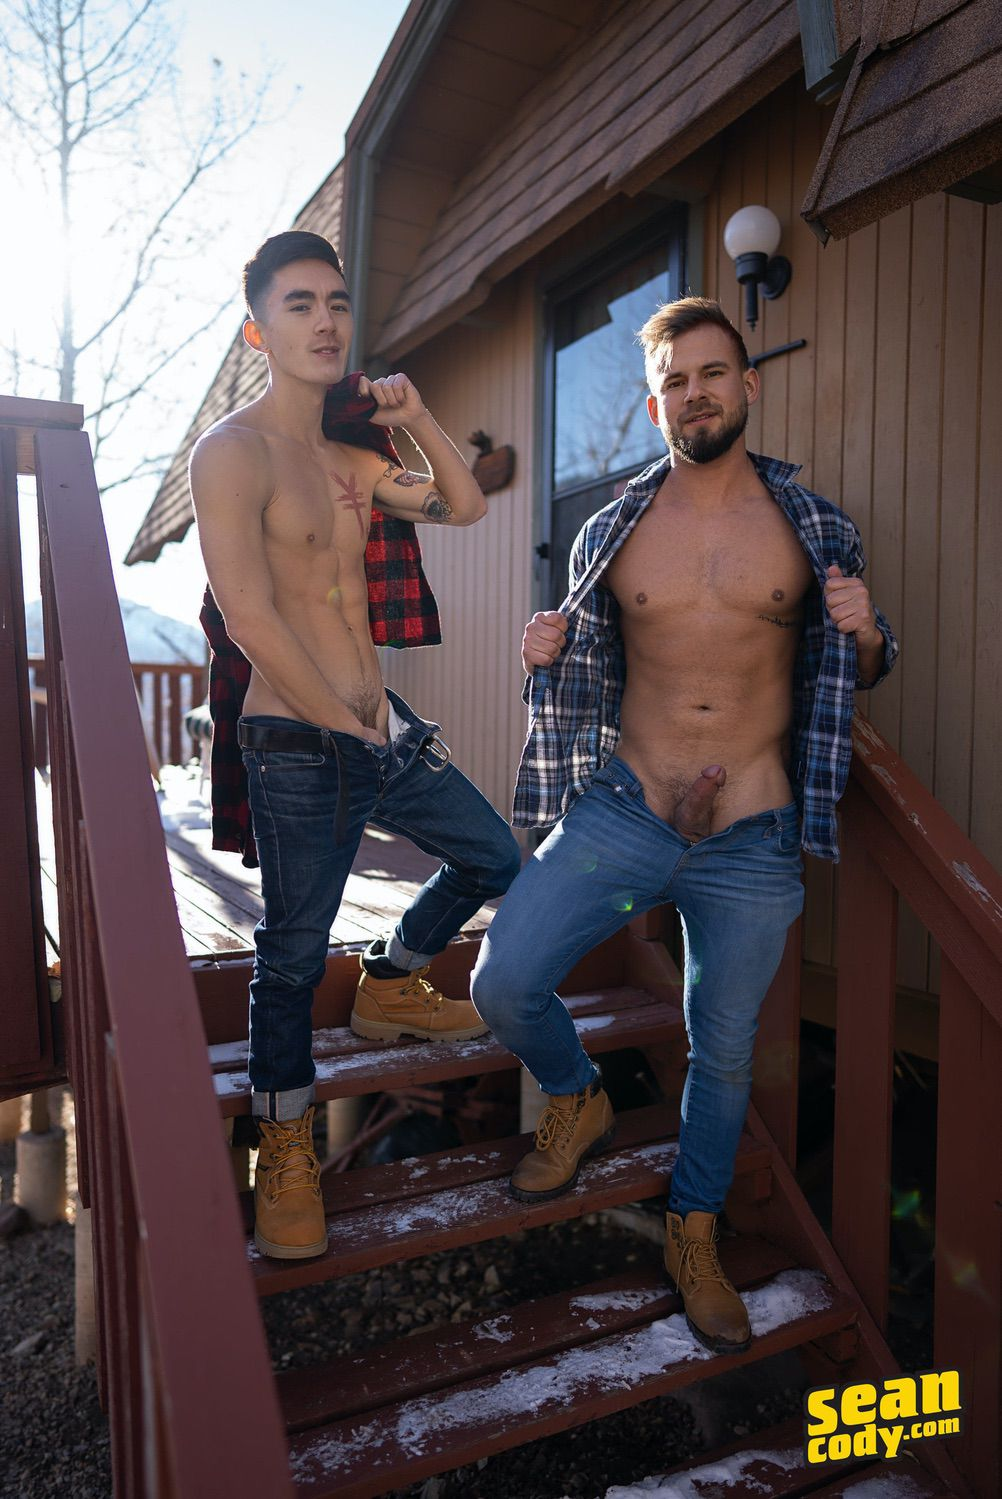 Sean Cody – Cody Seiya, Josh